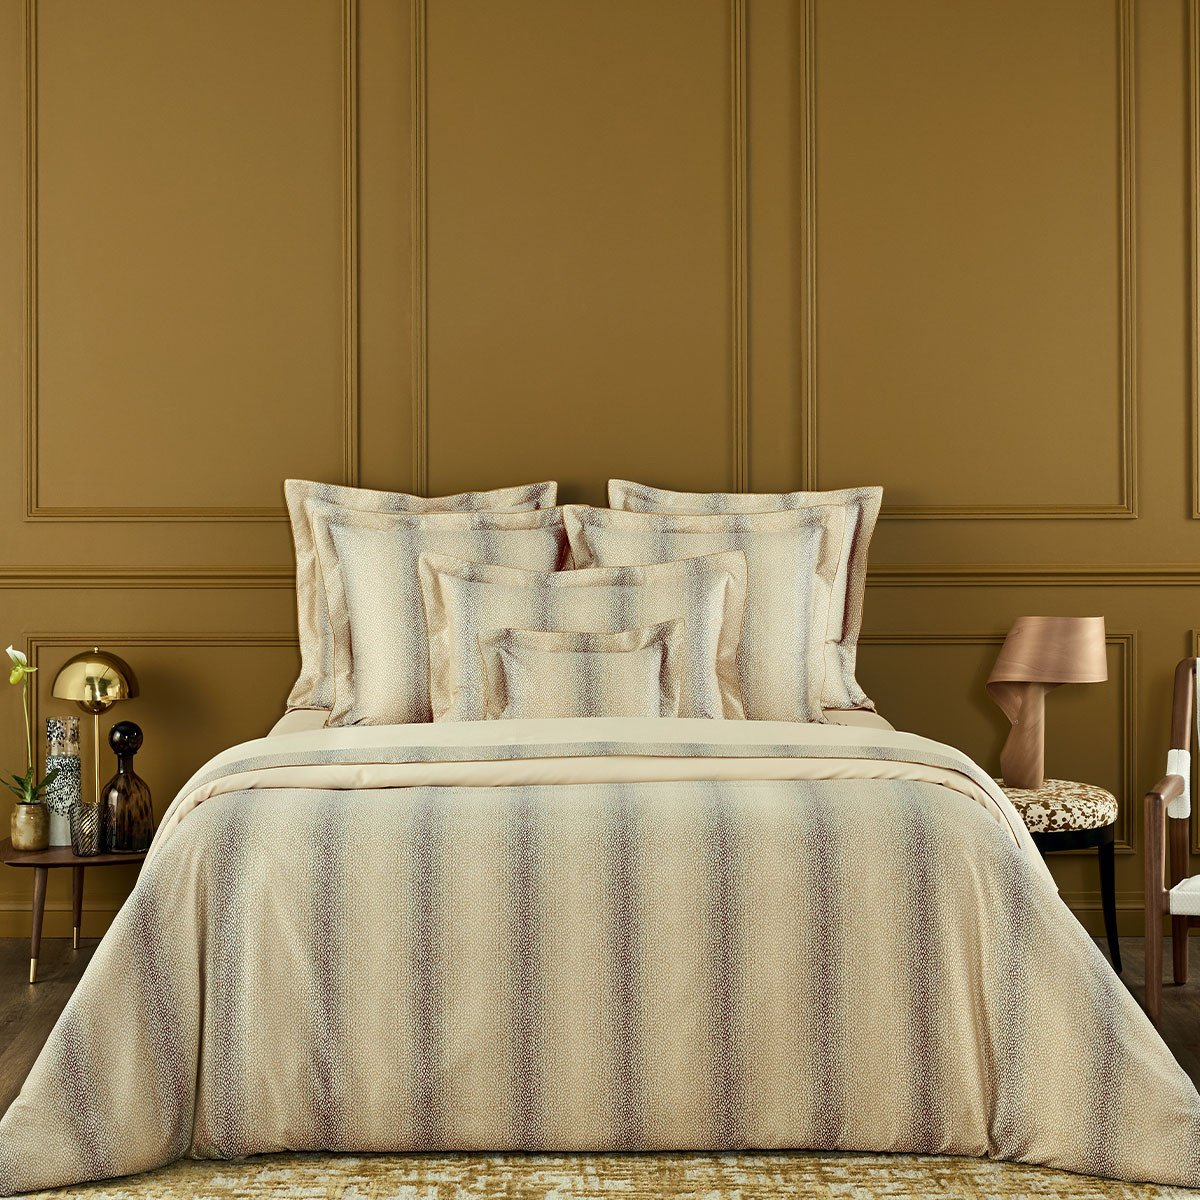 ECRIT DE LOIN Bed Series